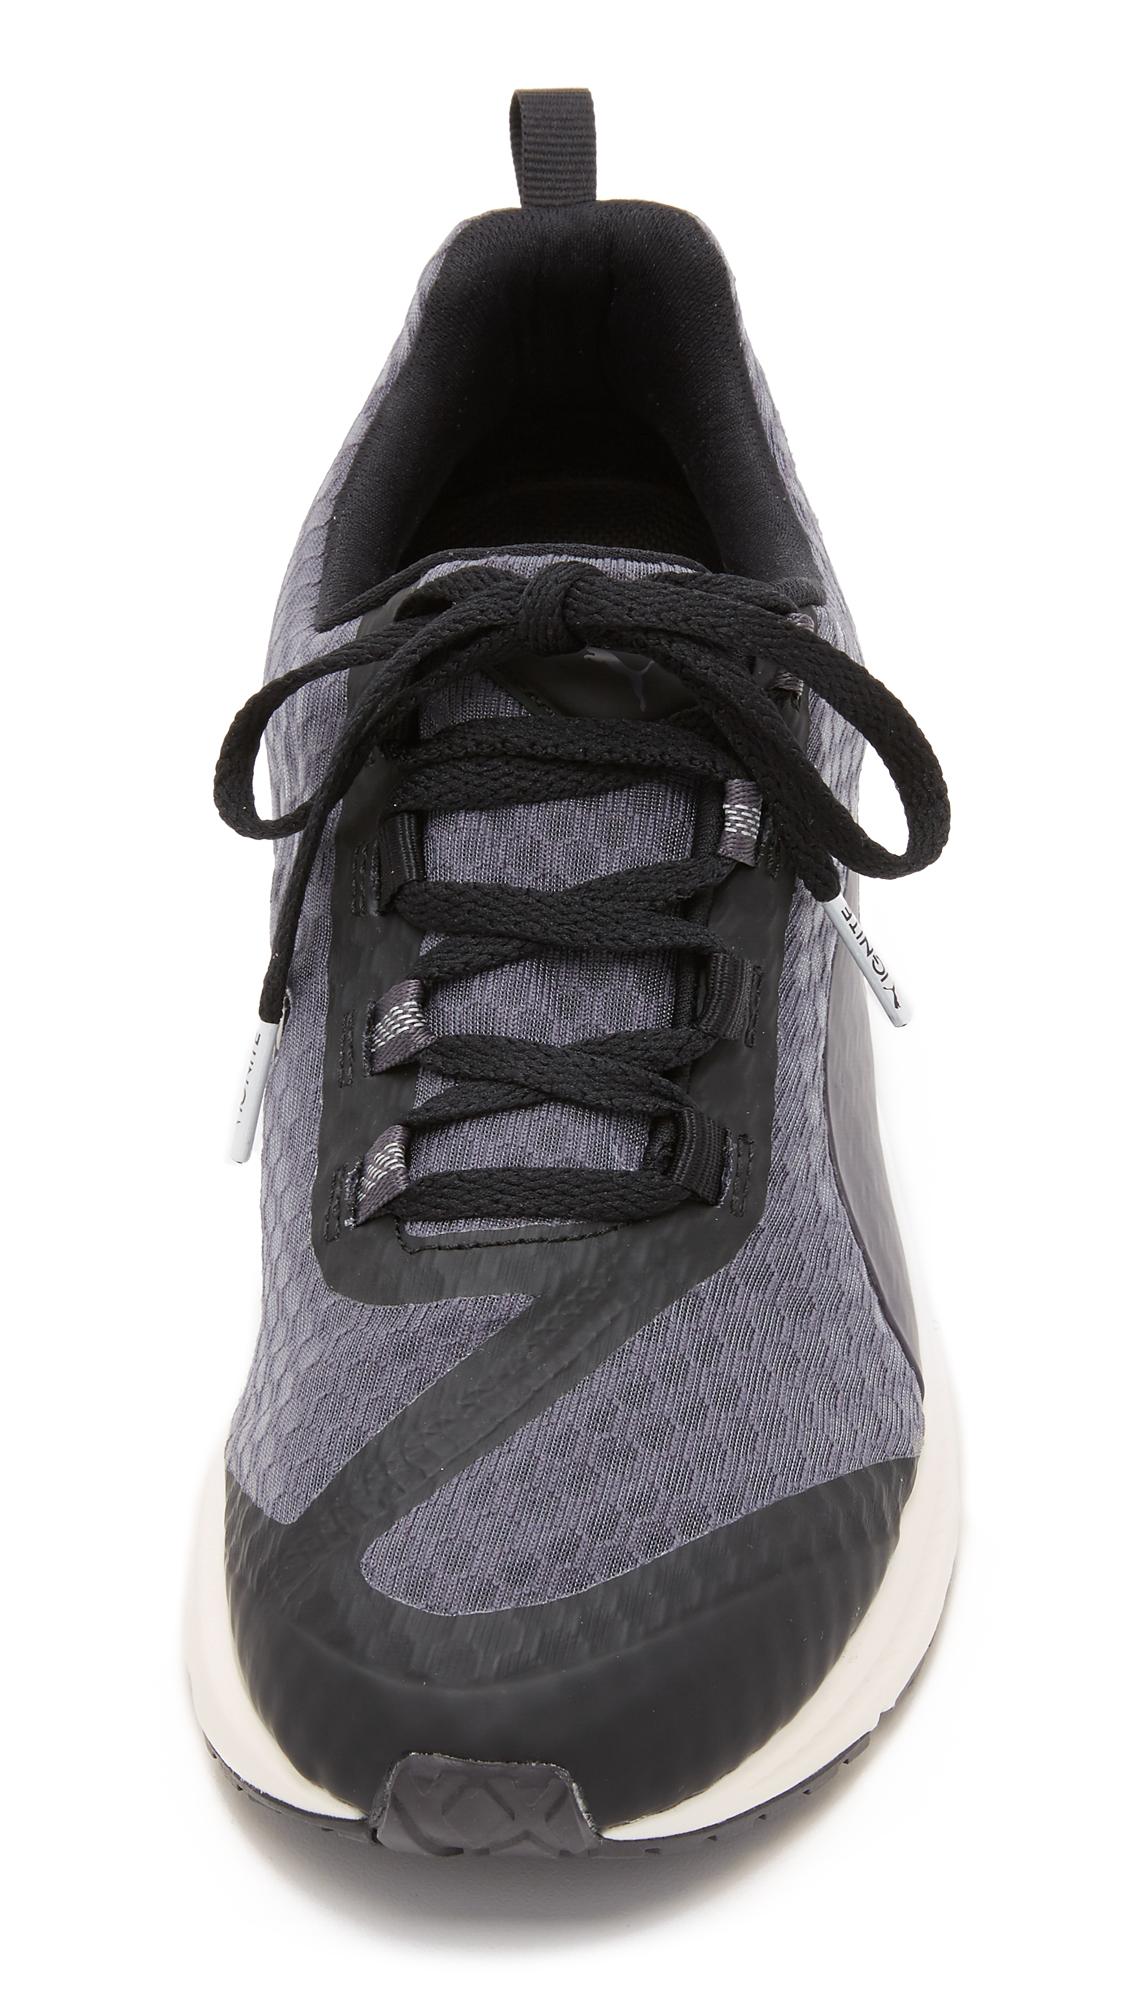 PUMA Ignite Xt Core Sneakers in Black